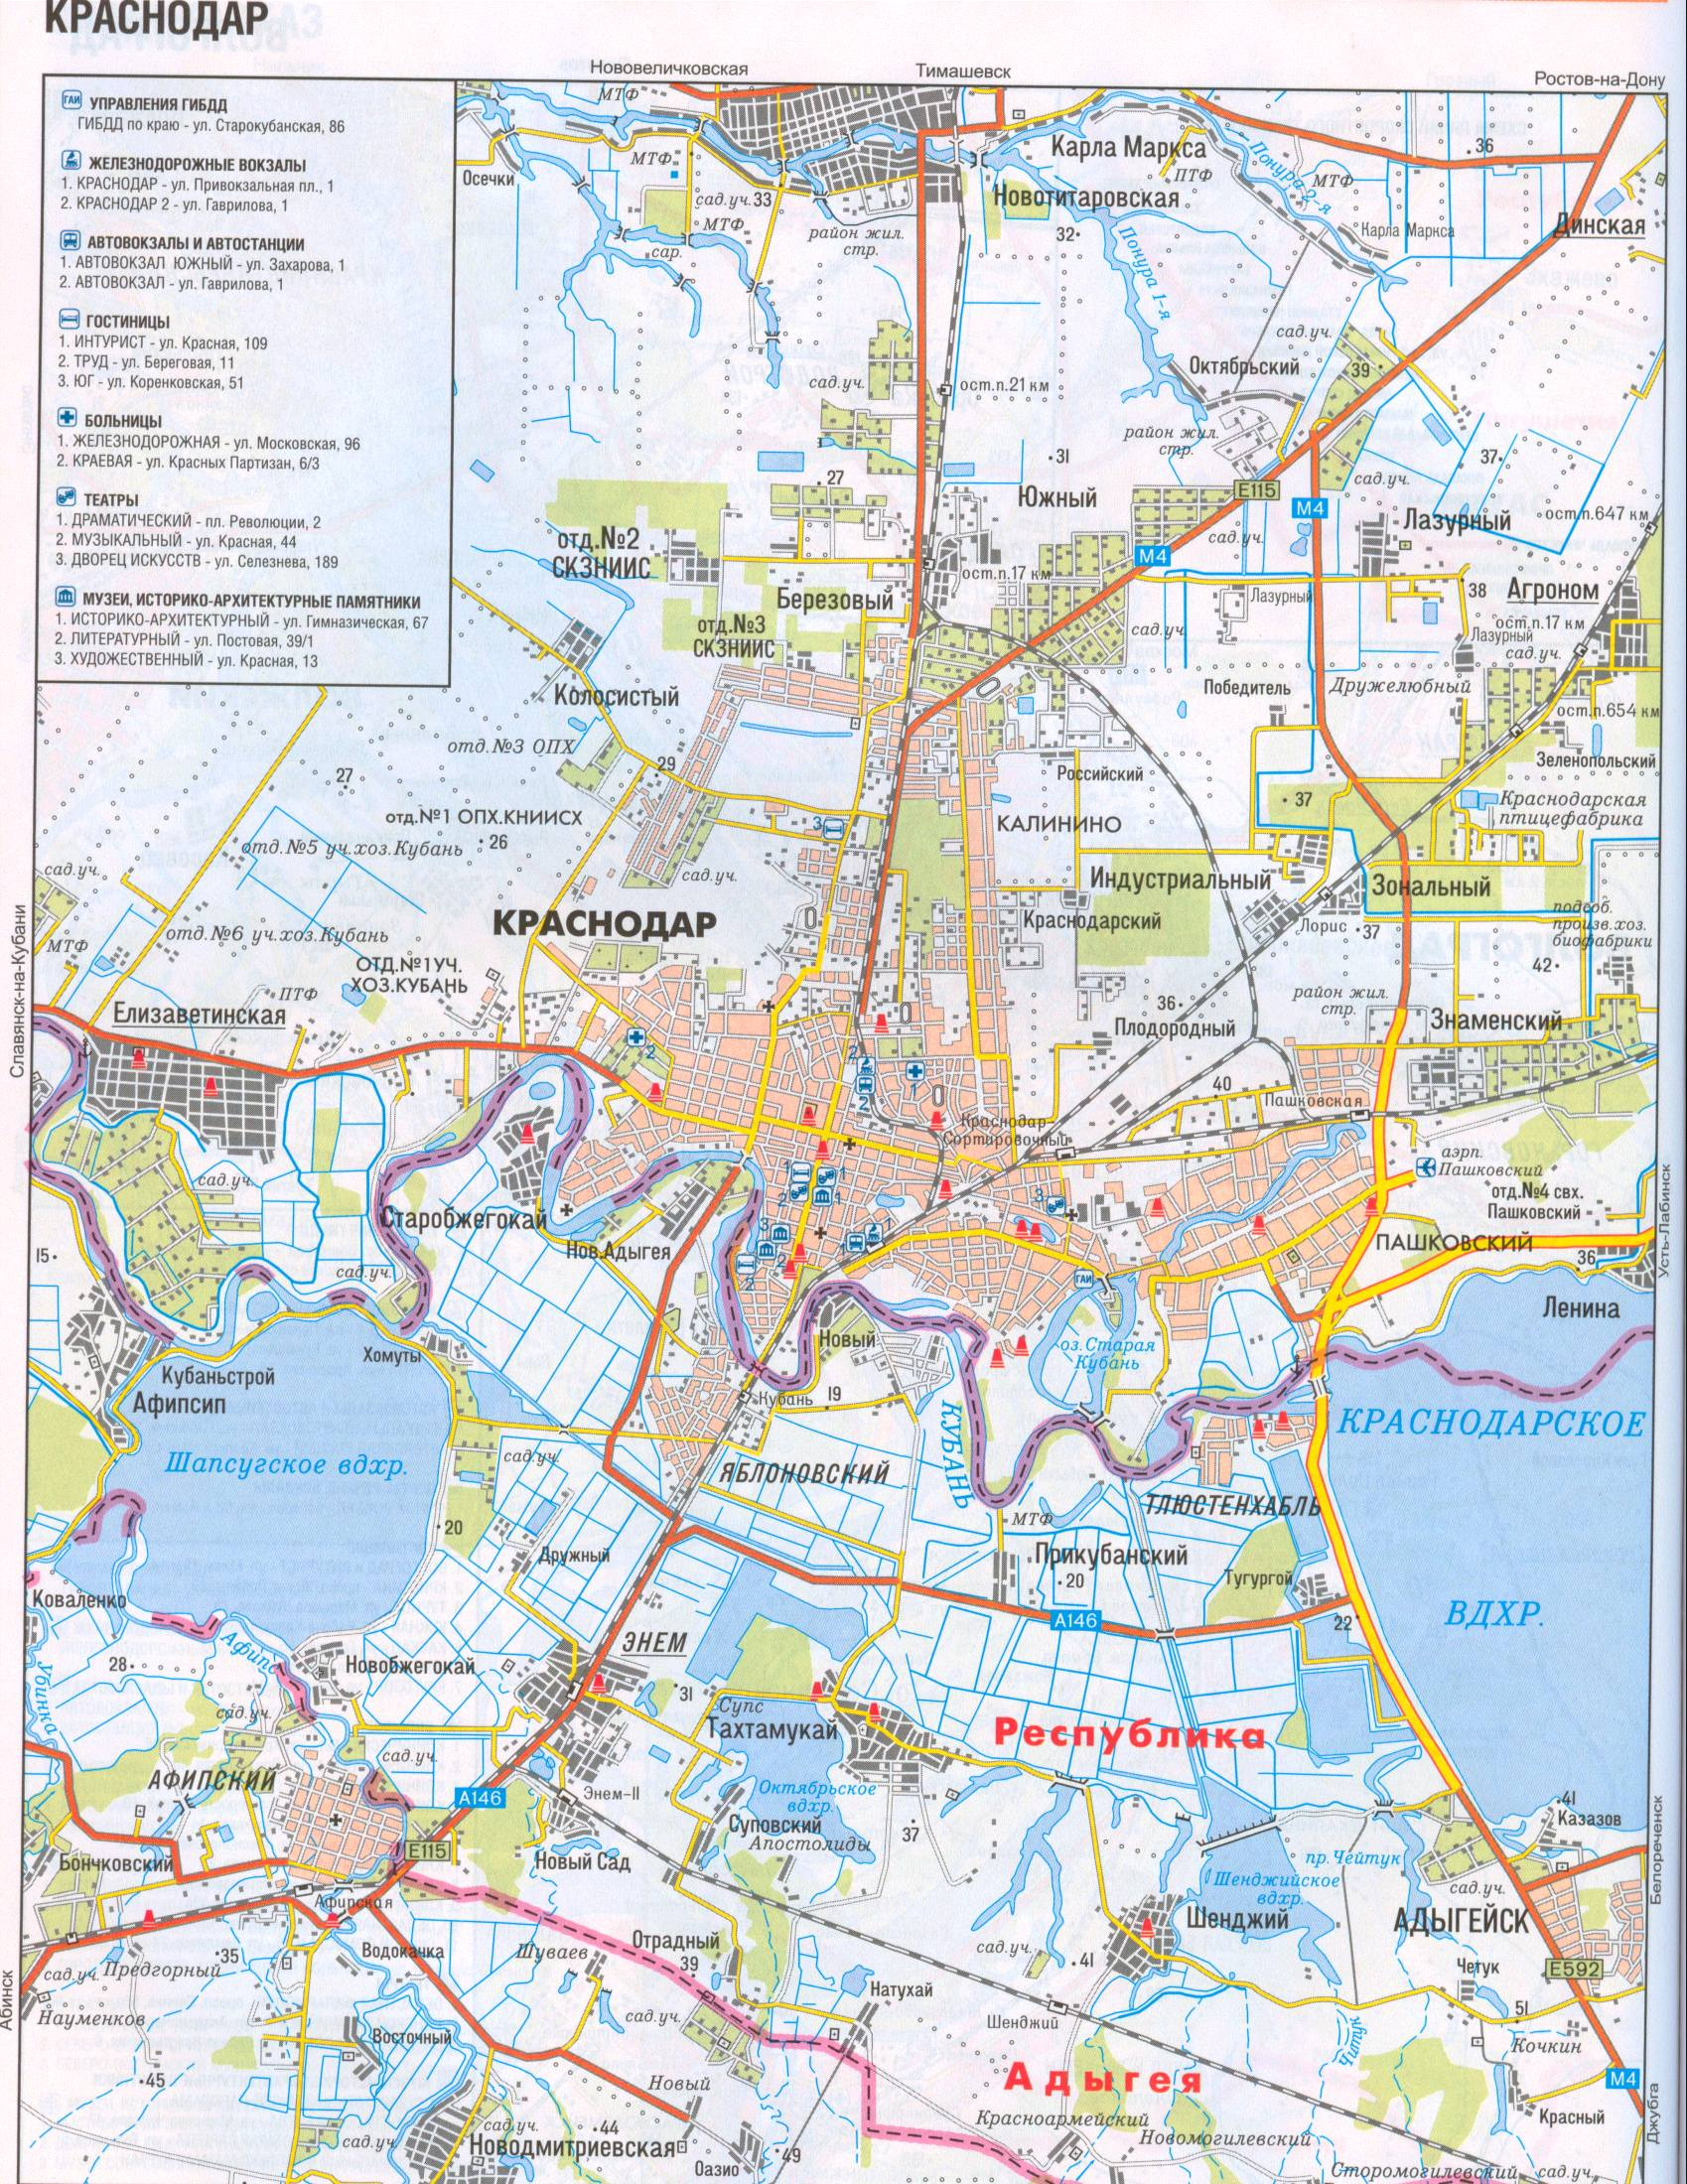 Карта Краснодара.  План города Краснодар, схема проезда авто транспорта.